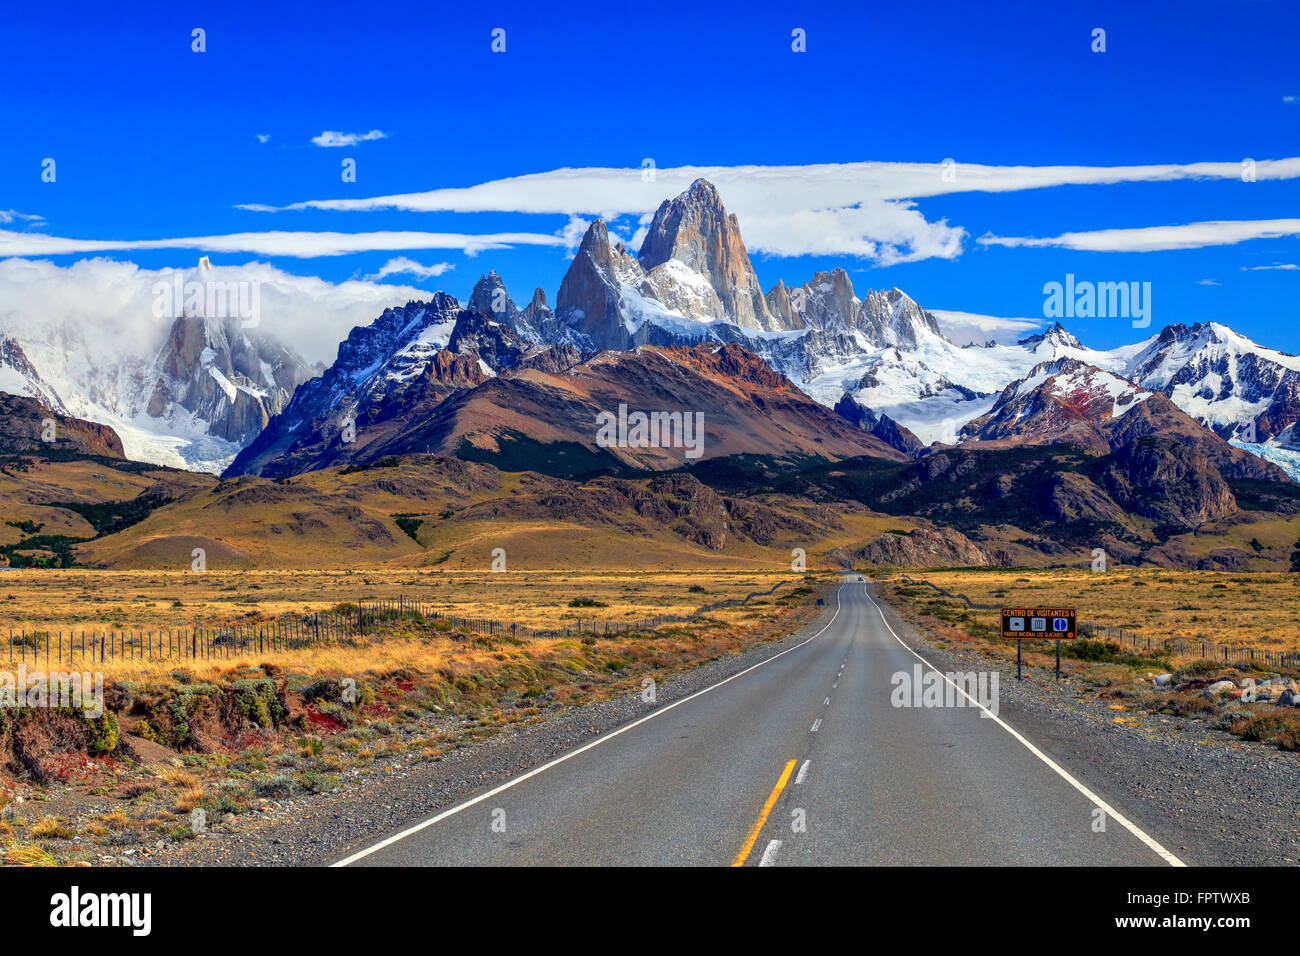 El Chalten, Santa Cruz, Patagonia Argentina - Stock Image